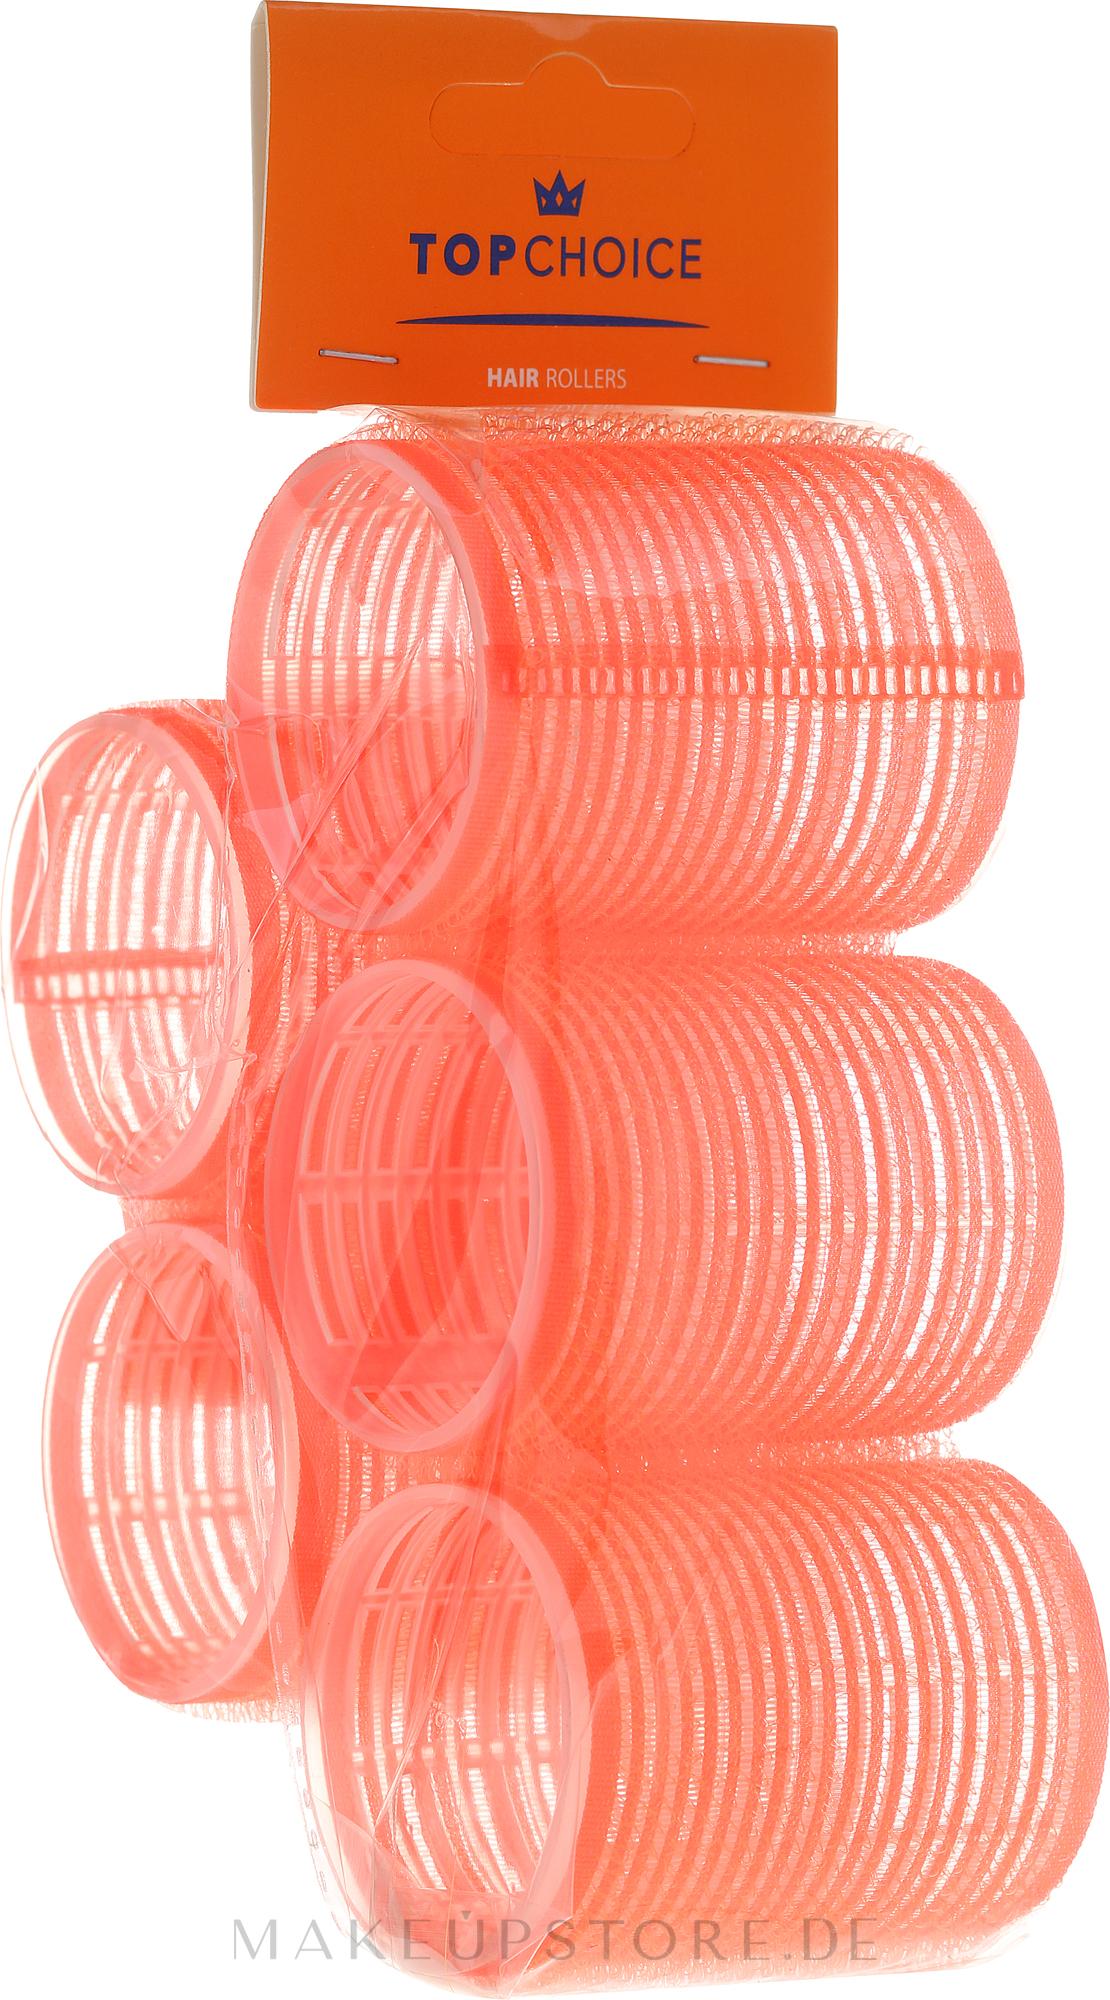 Klettwickler 0478 47 mm 5 St. - Top Choice Velcro — Bild 5 St.